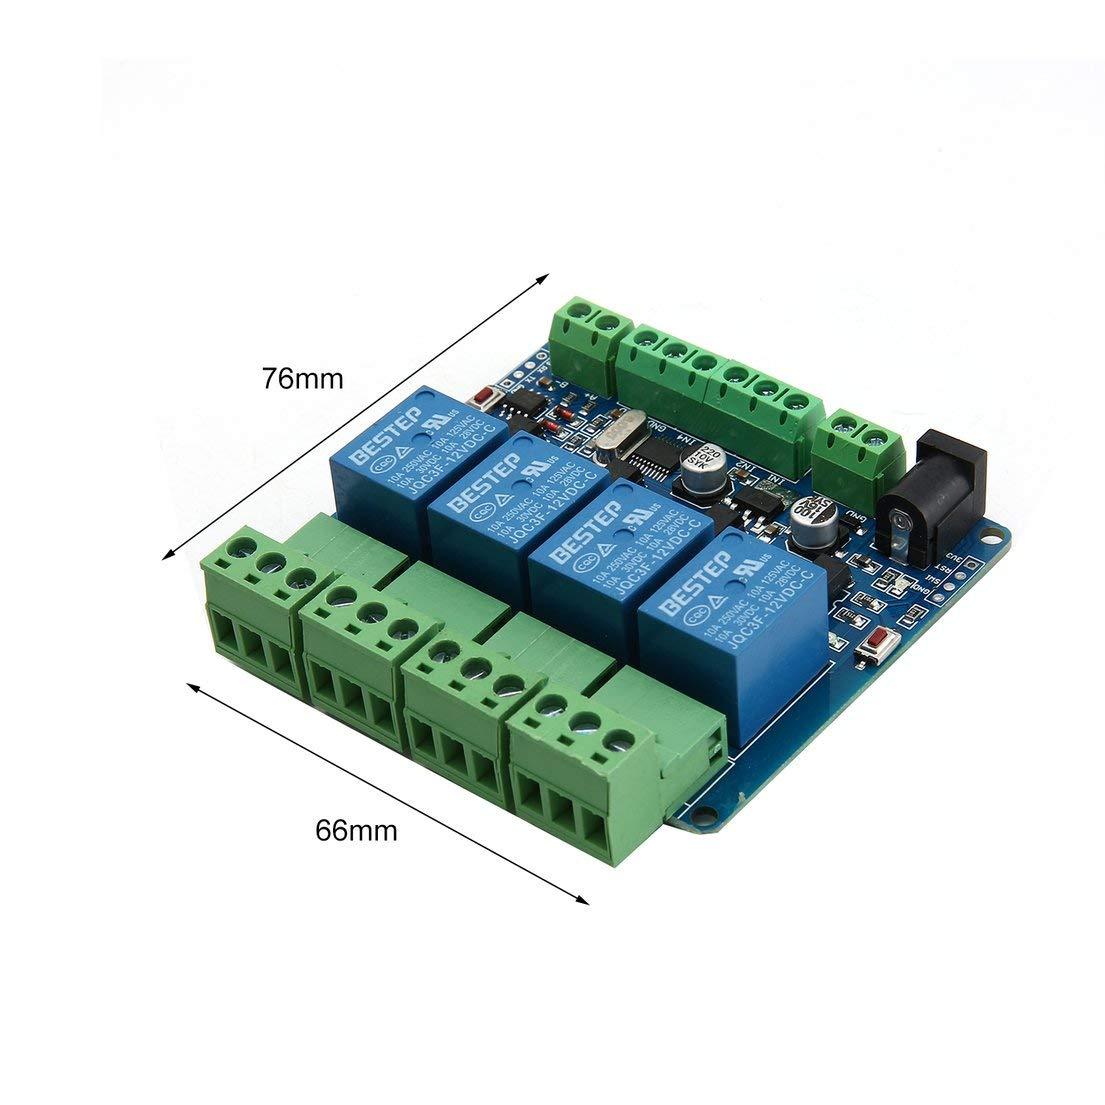 DF-ES 1PCS Modbus RTU 4 Canales 12V M/ódulo de Salida de rel/é M/ódulo de Entrada de Entrada RS485 TTL M/ódulo de comunicaci/ón Verde